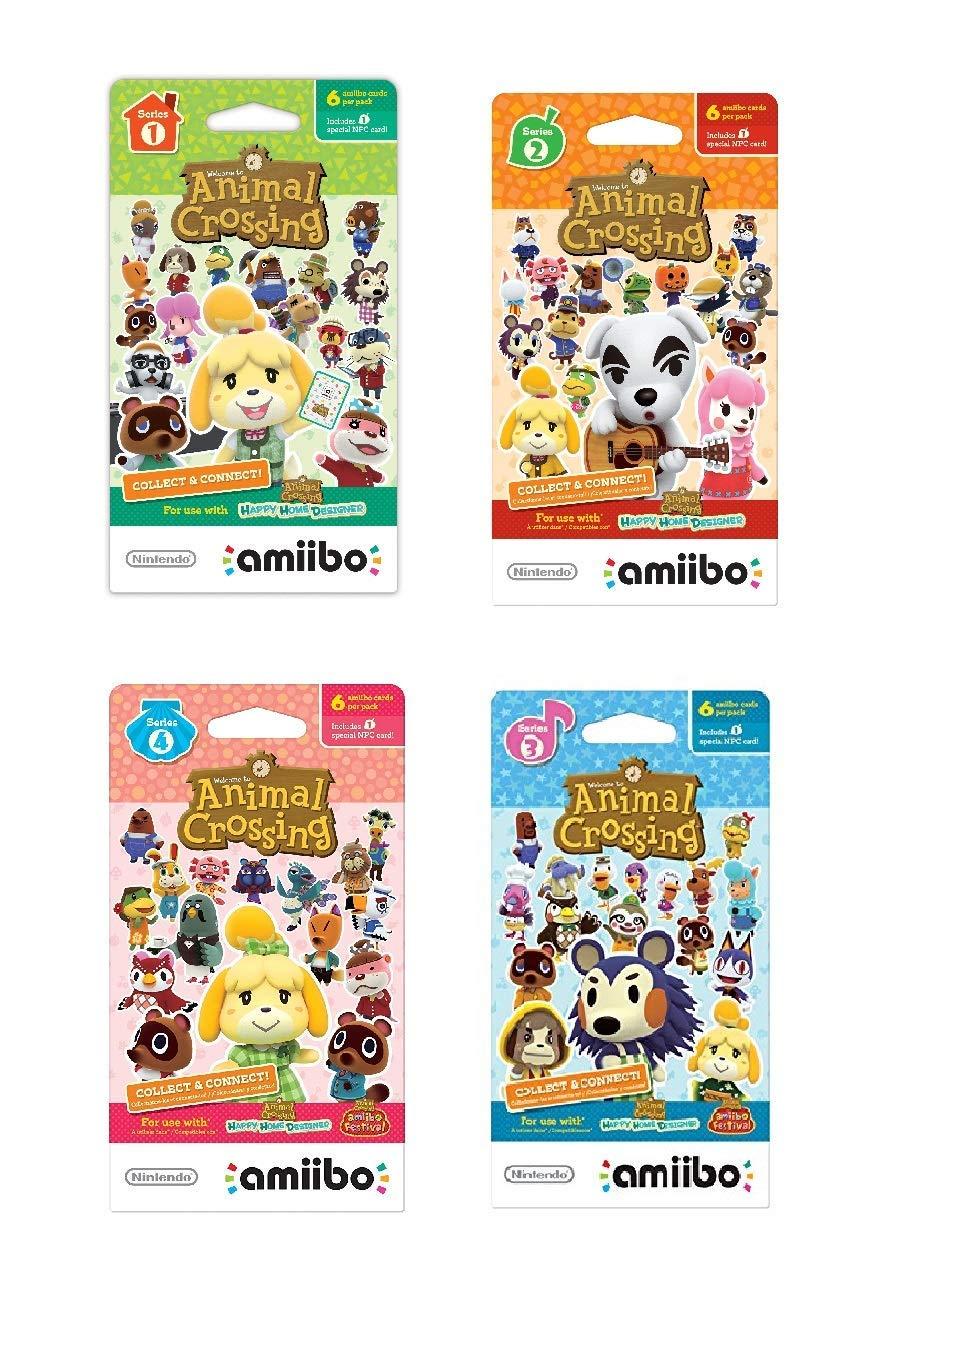 Wii U Video Game Consoles & Accessories ghdonat.com Animal ...